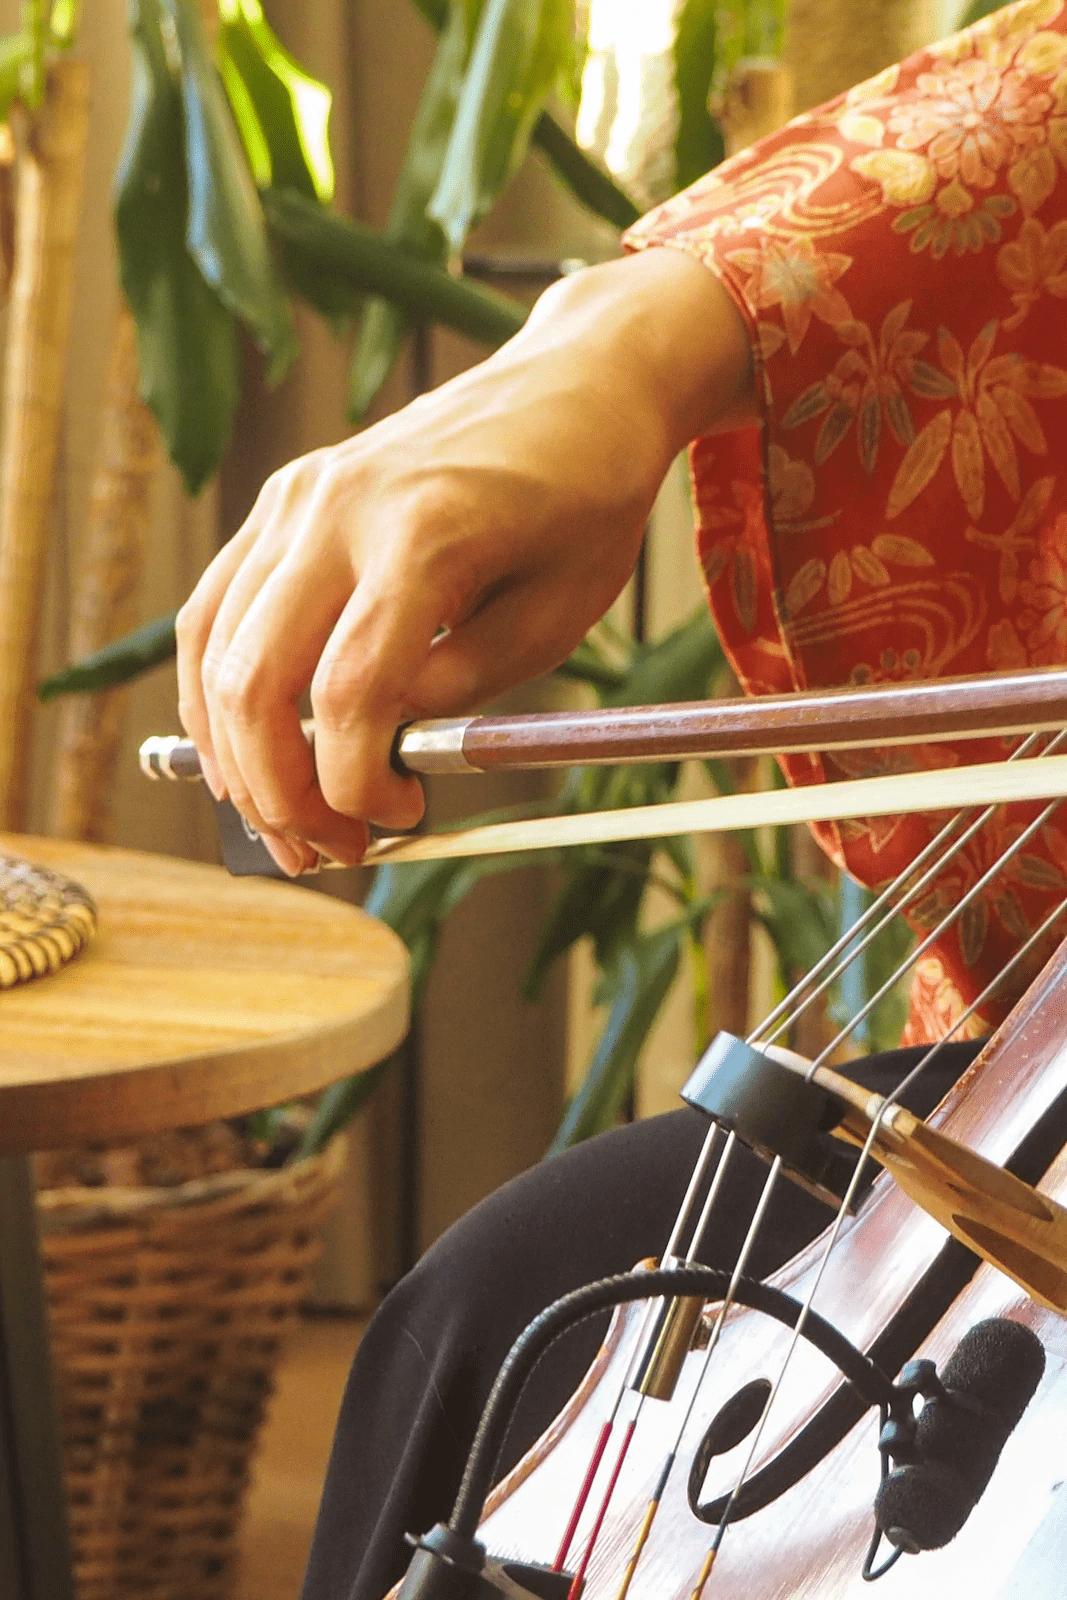 cello meditation cultural concert online cultural experience